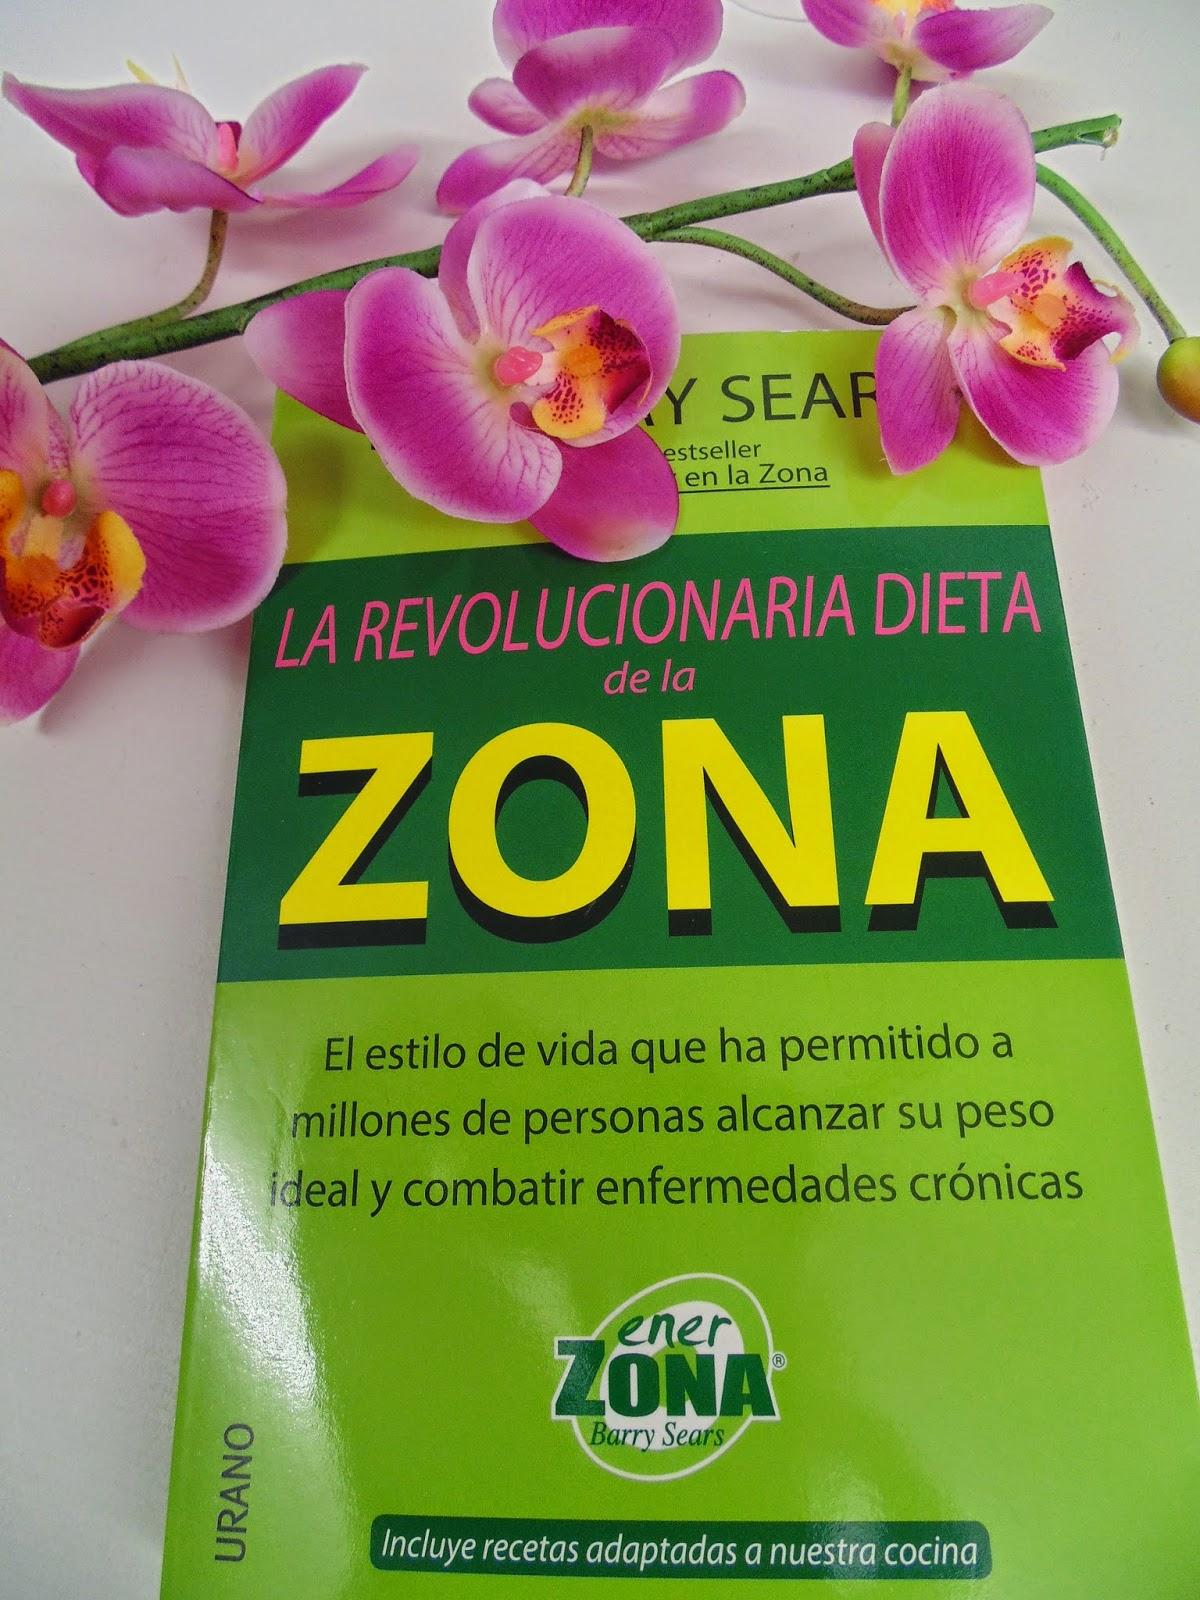 www.enerzona.es